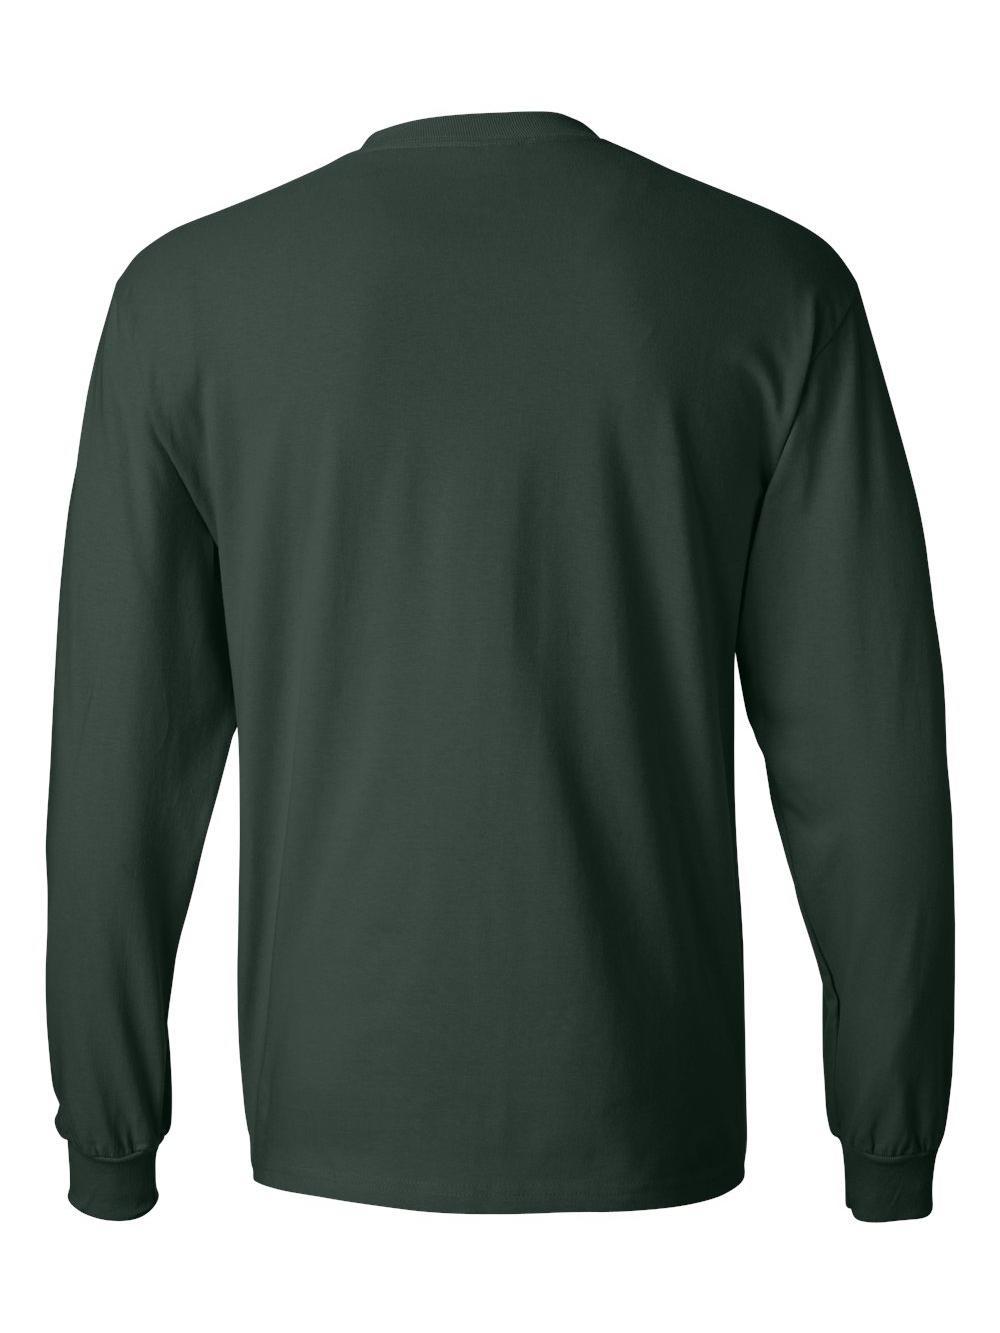 Hanes-Beefy-T-Long-Sleeve-T-Shirt-5186 thumbnail 25